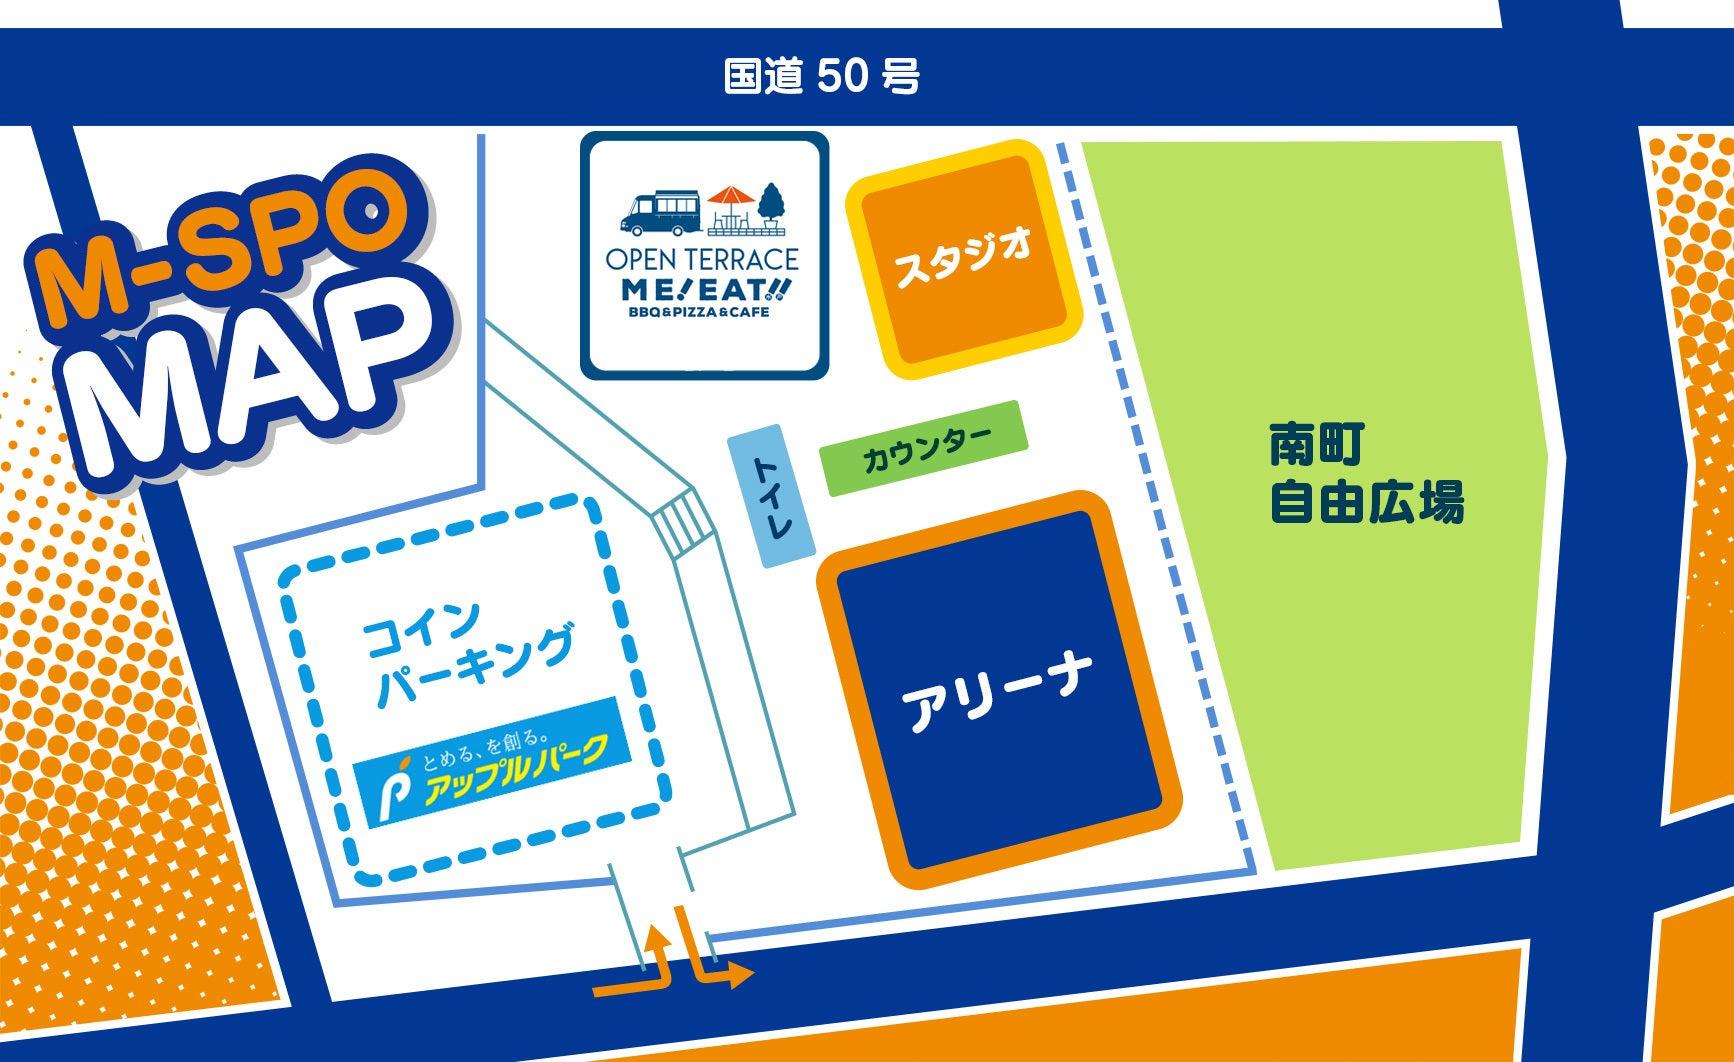 mspo_map.jpg